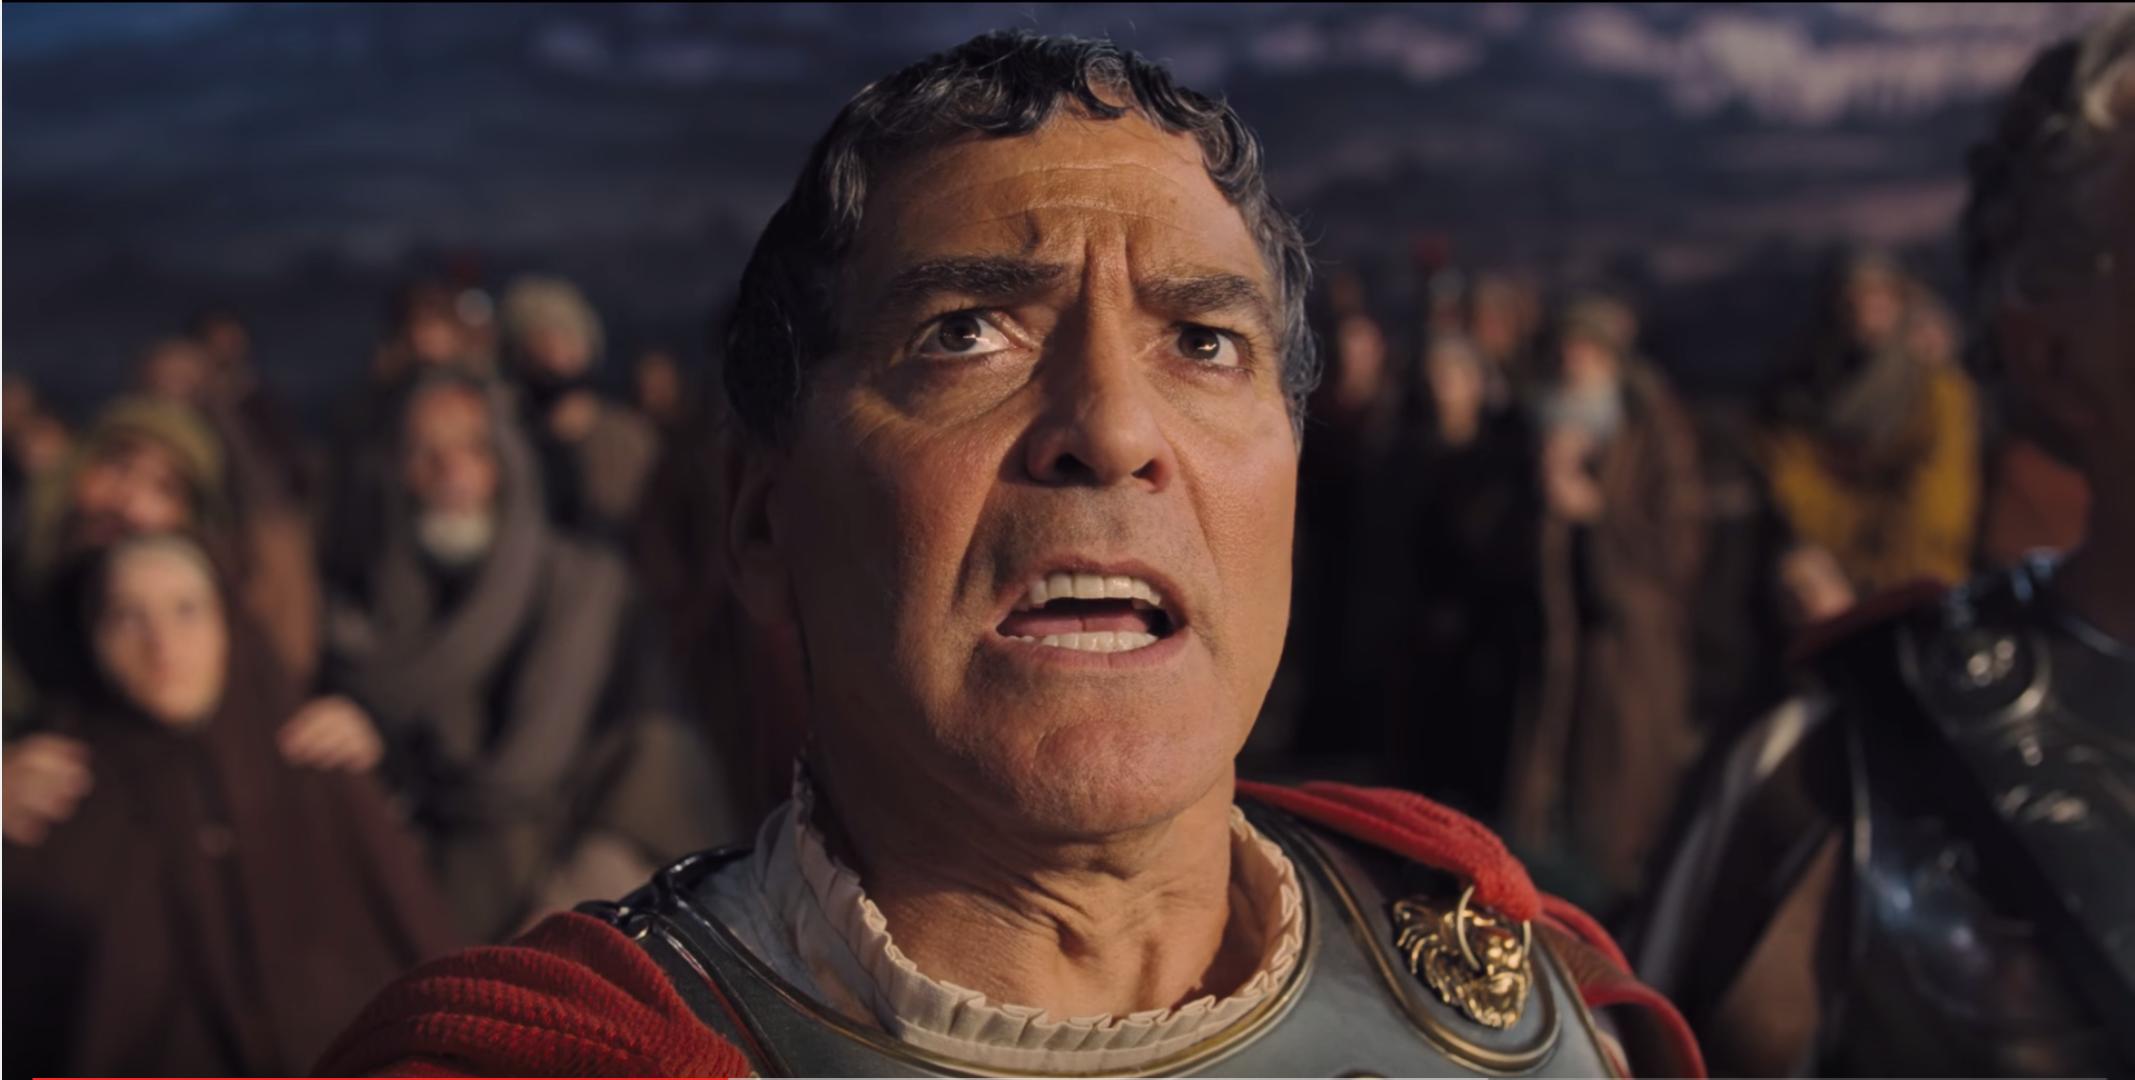 Look At The New Trailer 'Hail, Caesar!' With Josh Brolin, George Clooney, Jonah Hill, Scarlett Johansson, Tilda Swinton and Channing Tatum